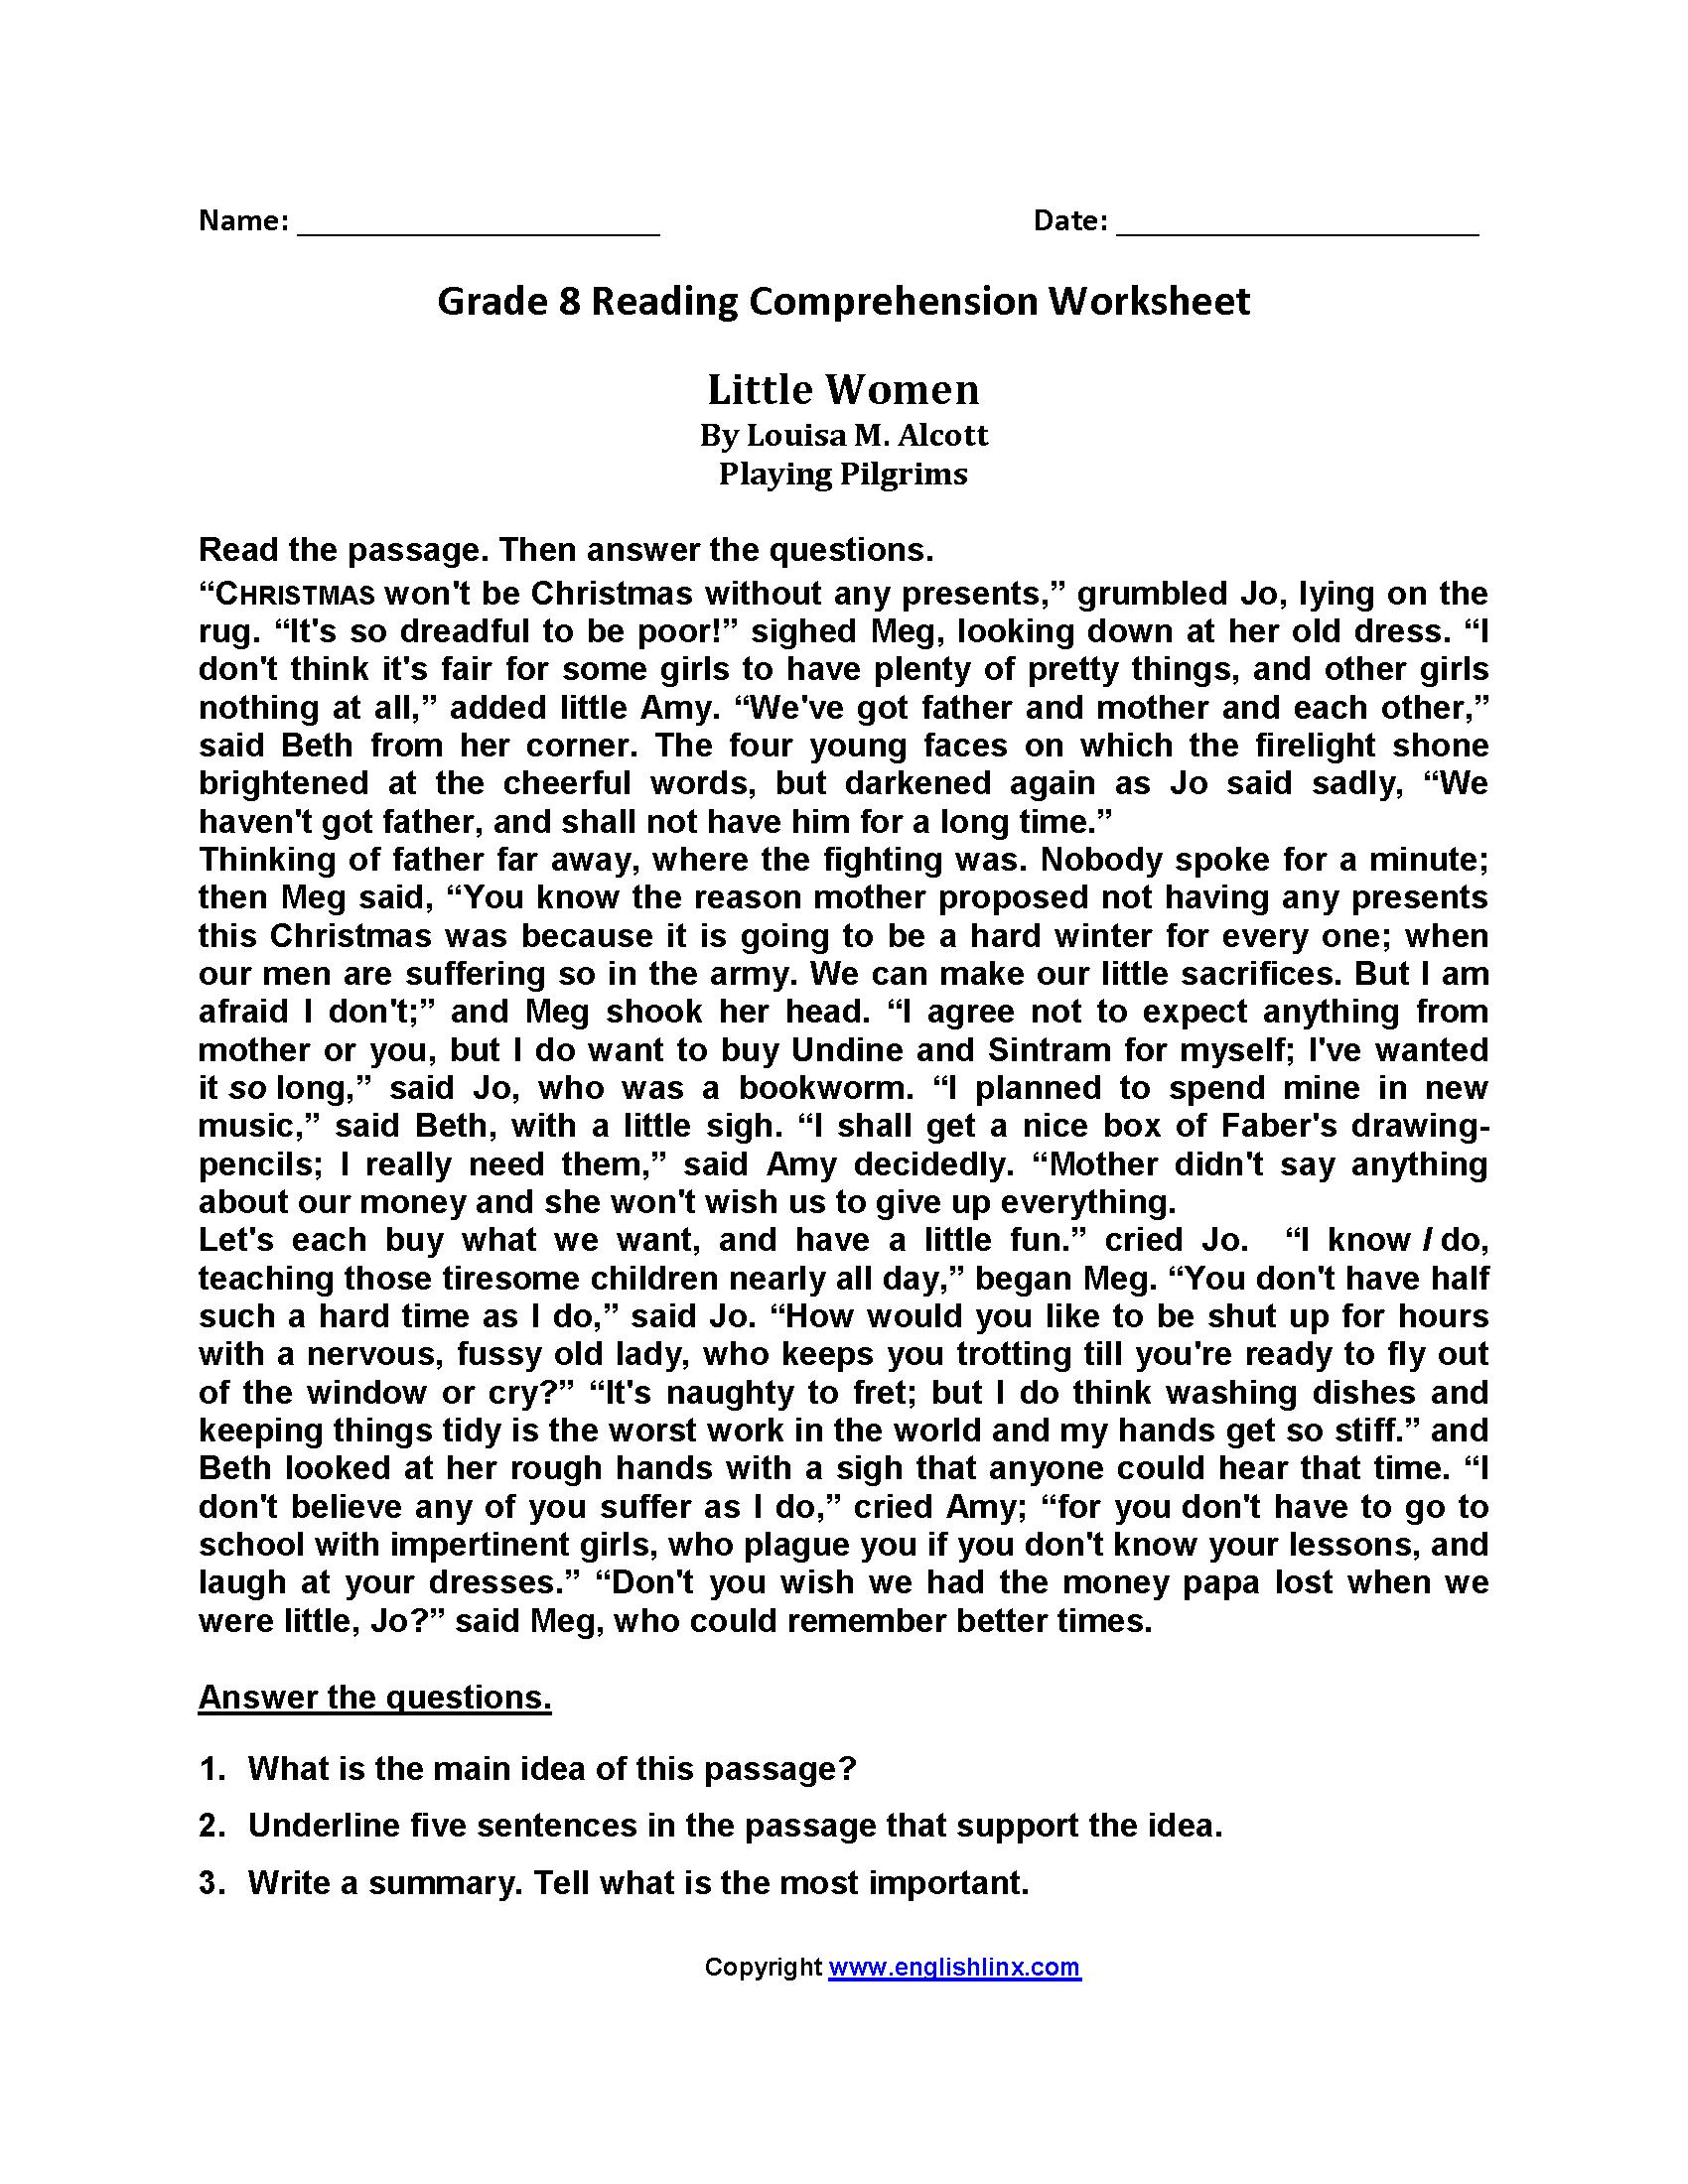 Reading Worksheets  Eighth Grade Reading Worksheets Along With Pilgrims Reading Comprehension Worksheet